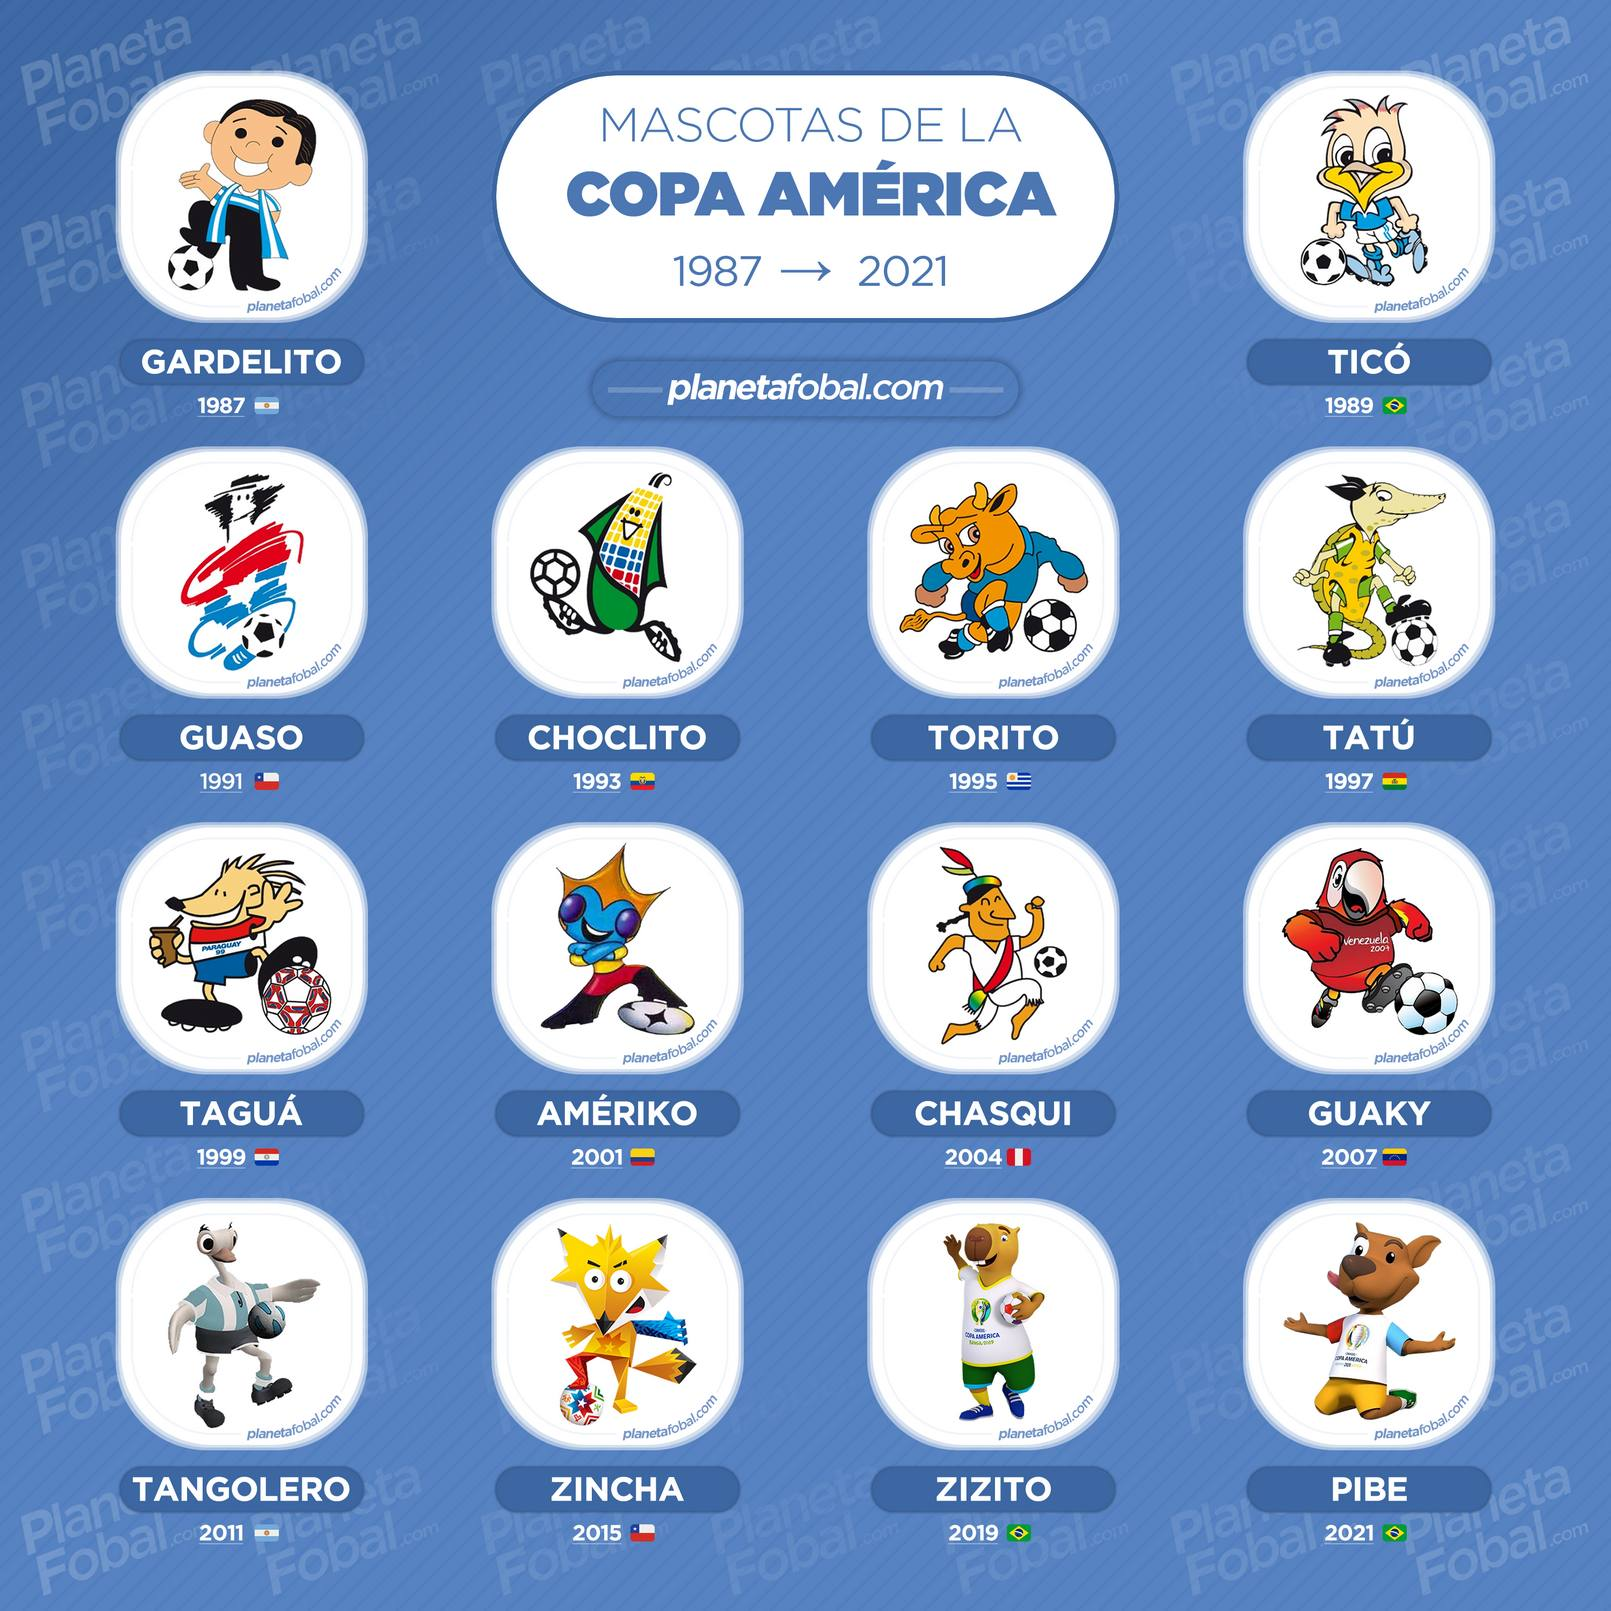 Todas las mascotas de la Copa América | @planetafobal